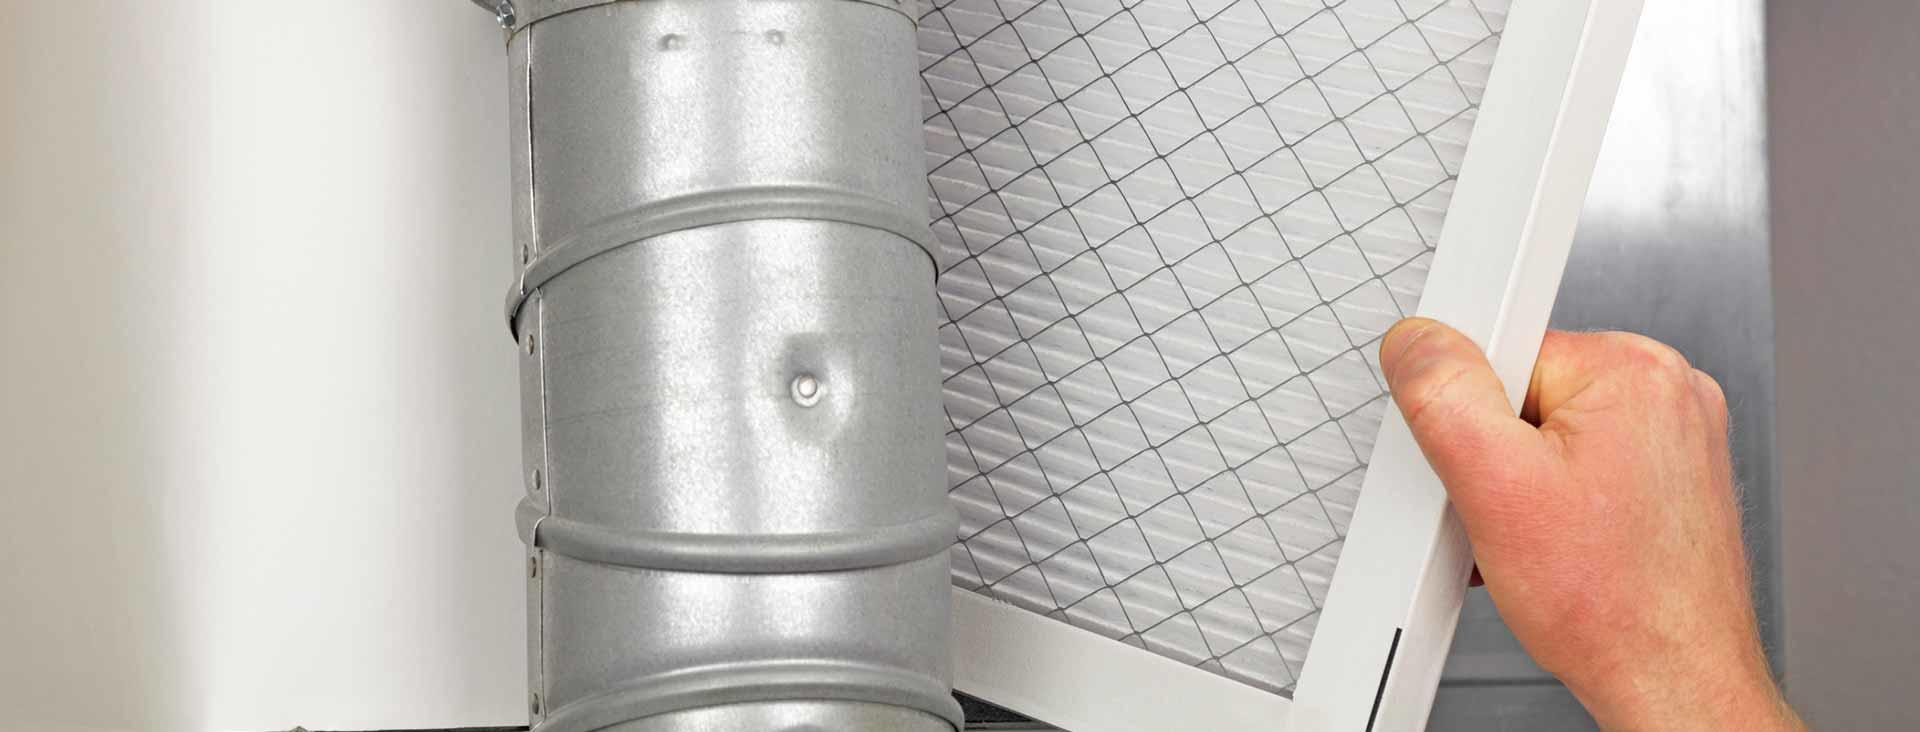 Air Express Heating & Air Conditioning image 9